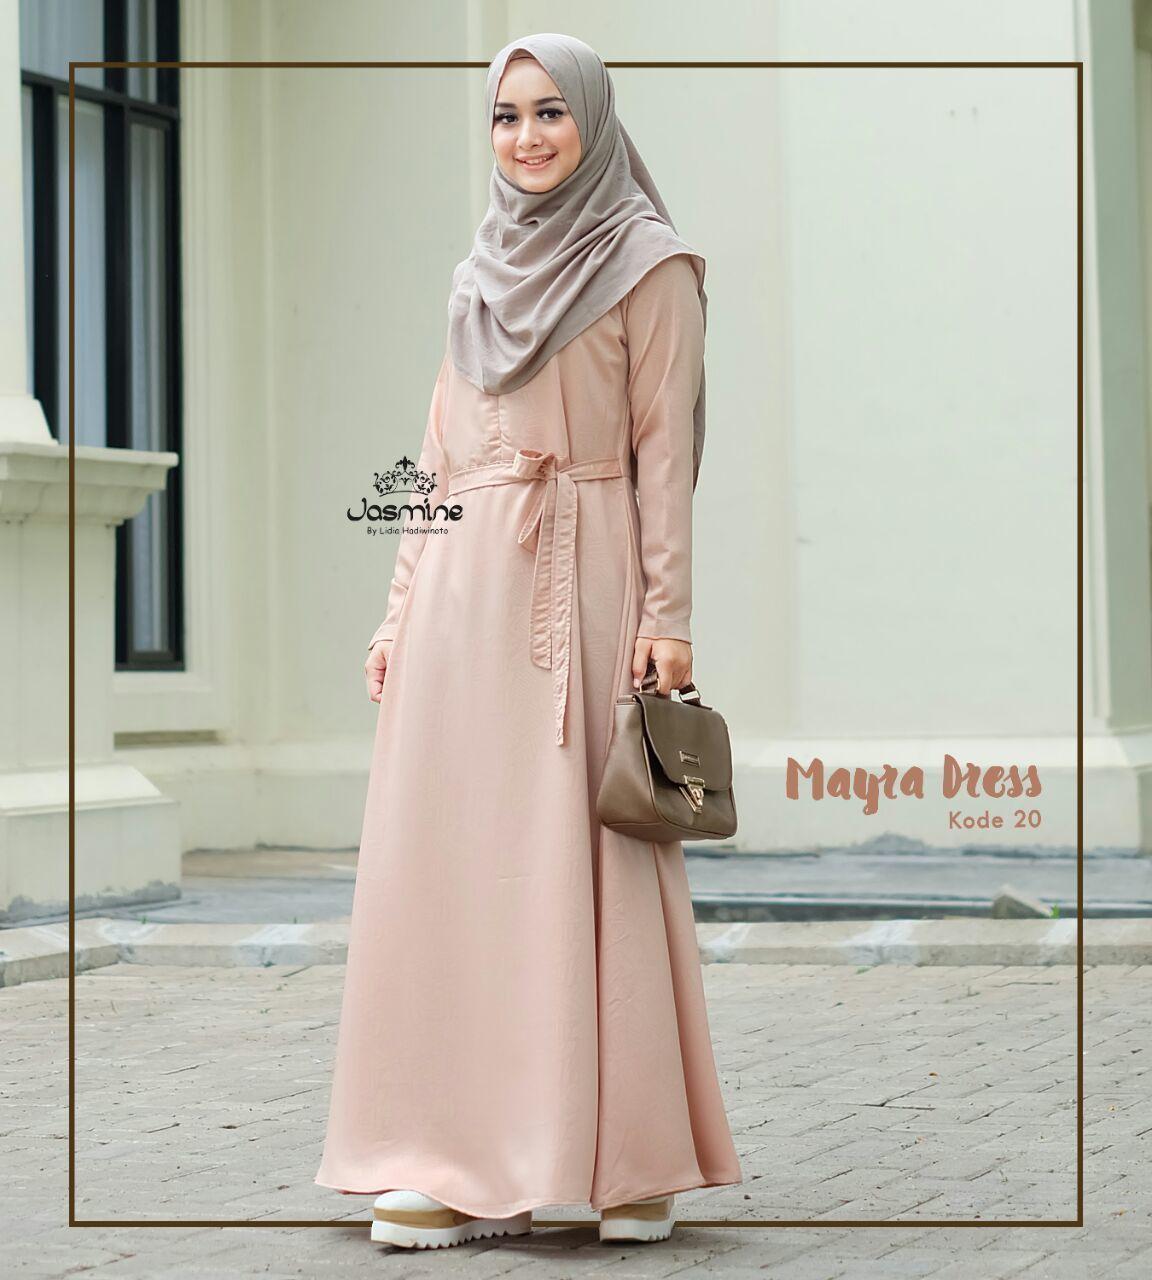 Gamis Jasmine Mayra Dress 20 Baju Gamis Wanita Busana Muslim